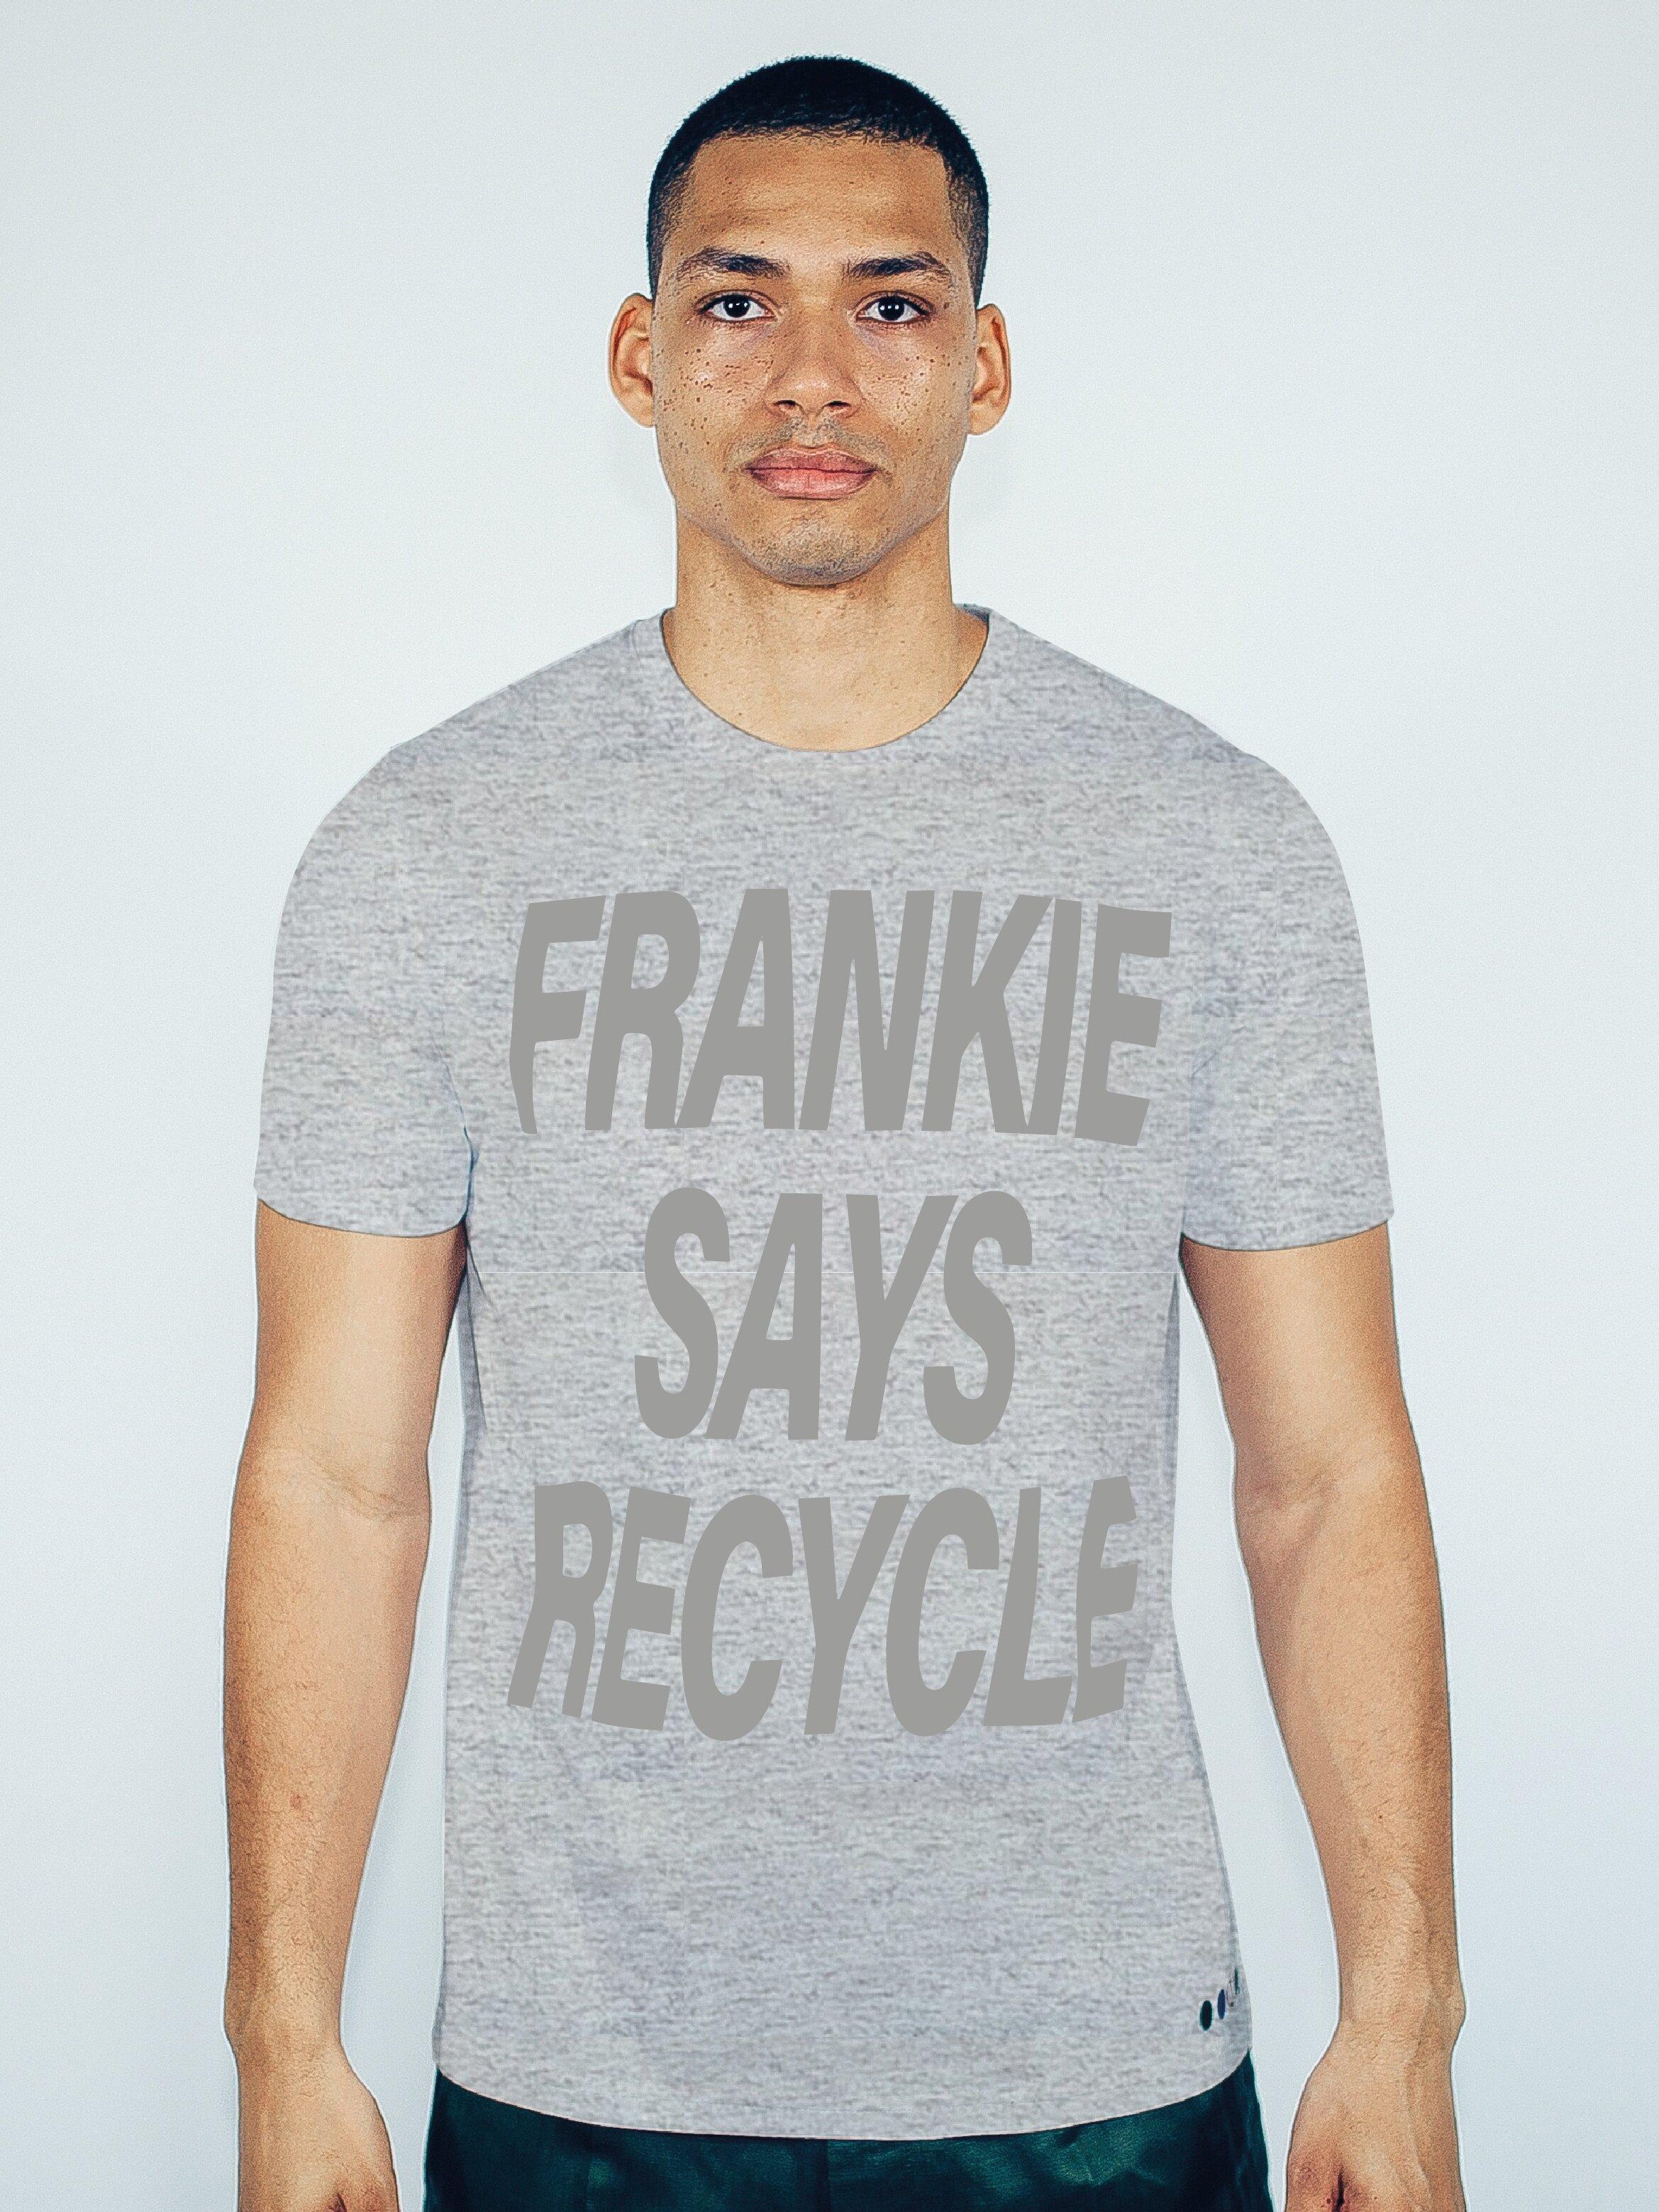 FRANKIE SAYS TSHIRT - MENS GREY from TOBEFRANK